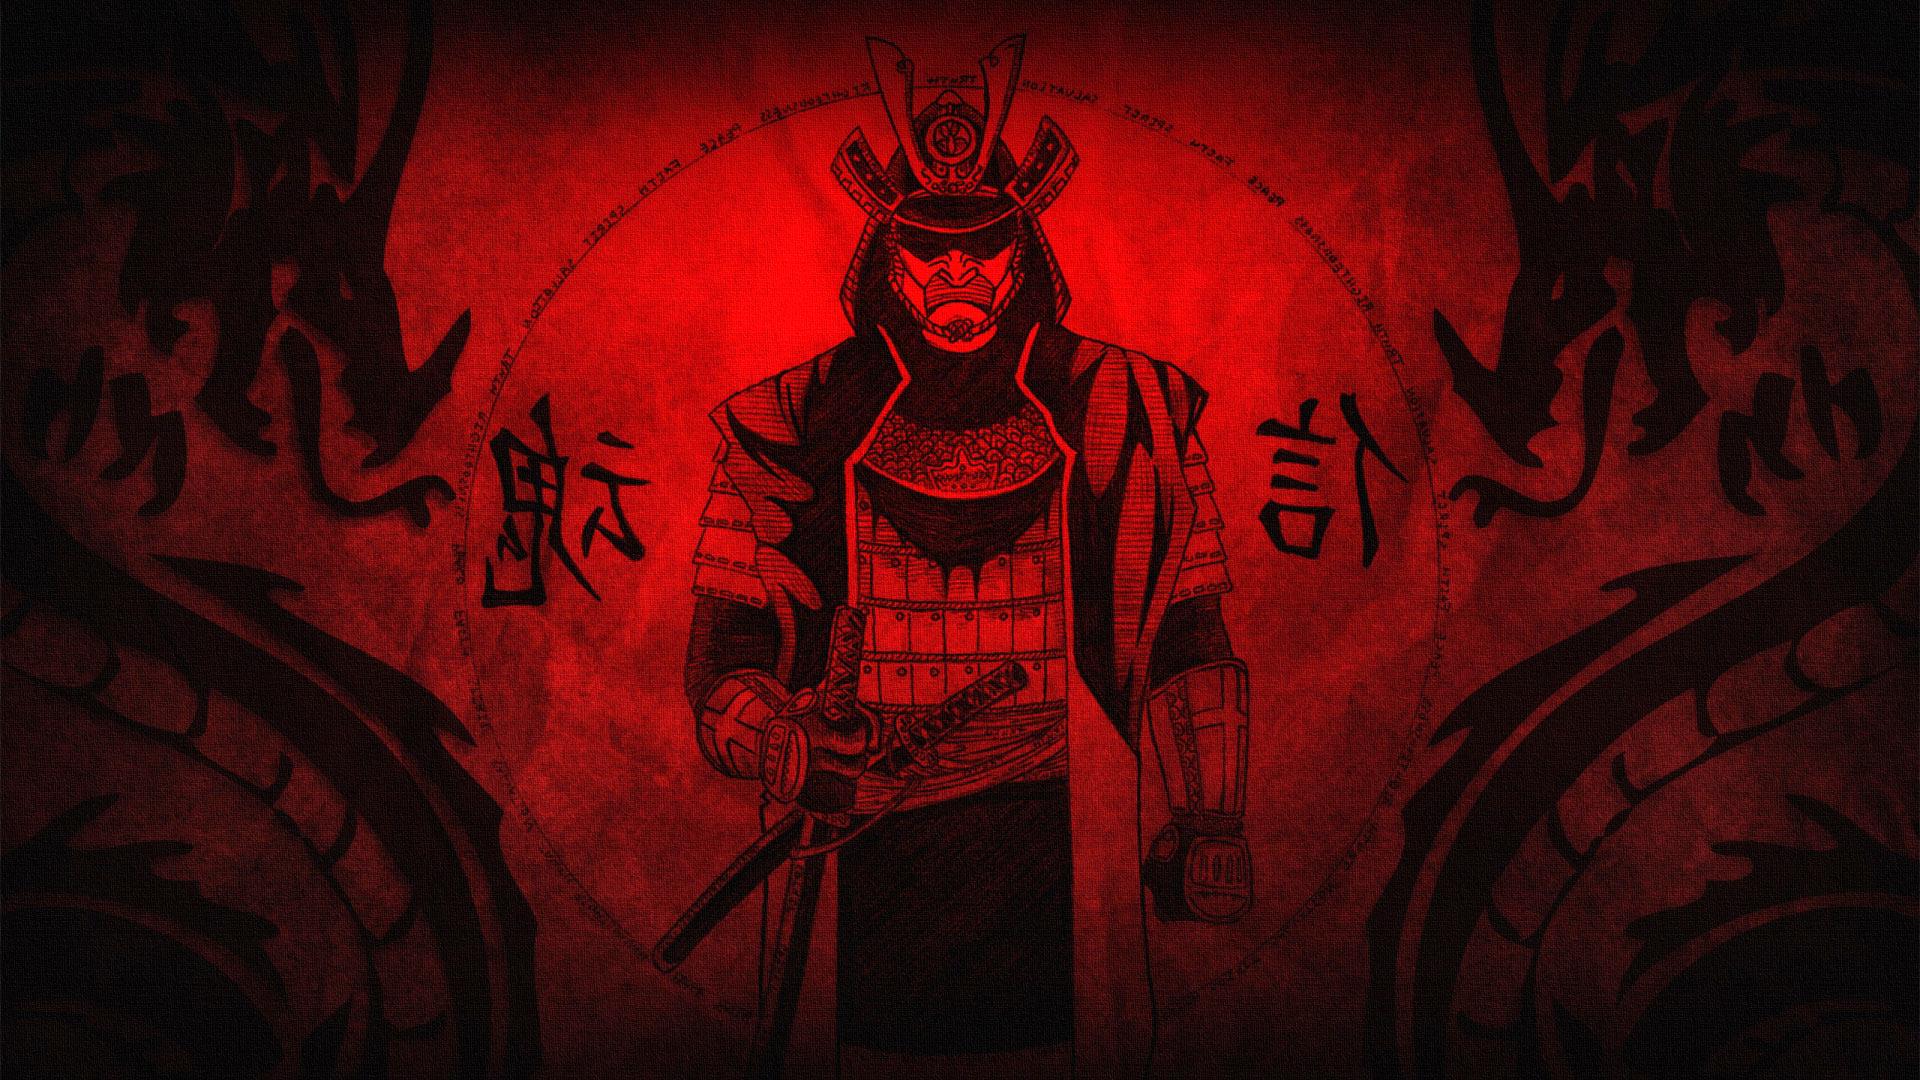 Картинки белка самурай на рабочий стол  Фэнтези